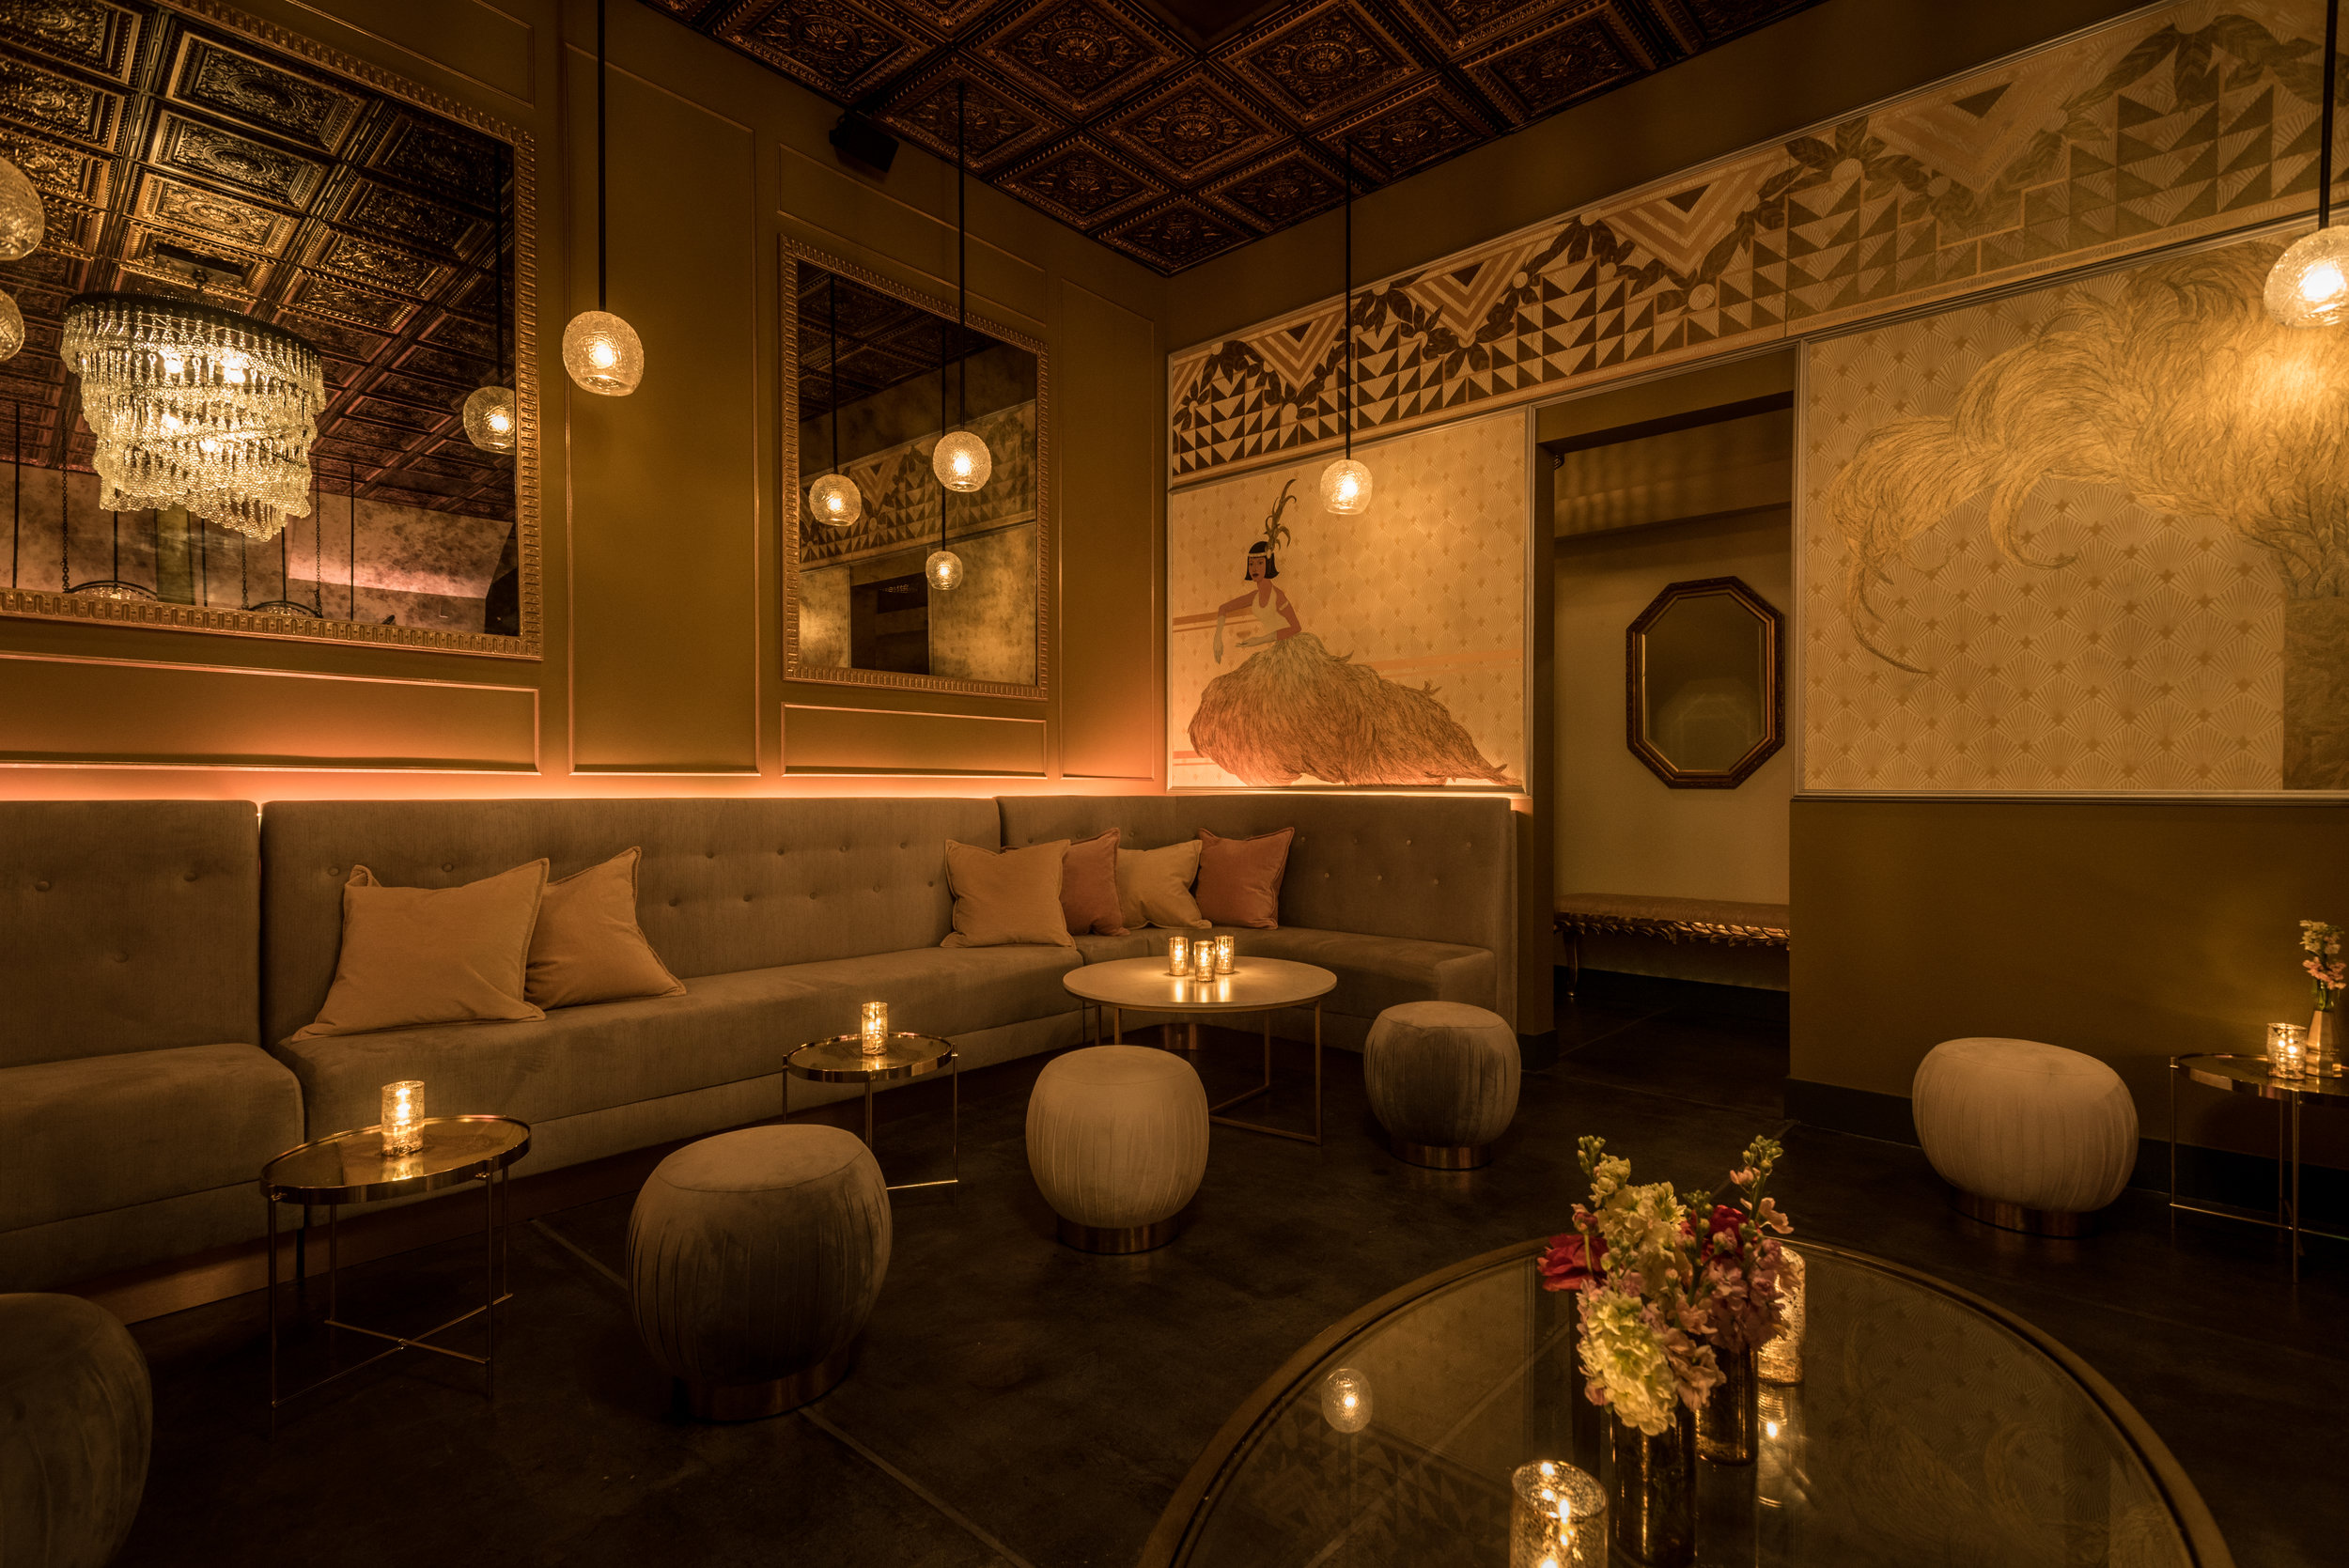 Genever bar in Los Angeles' Historic Filipinotown. Photo by Wonho Frank Lee.